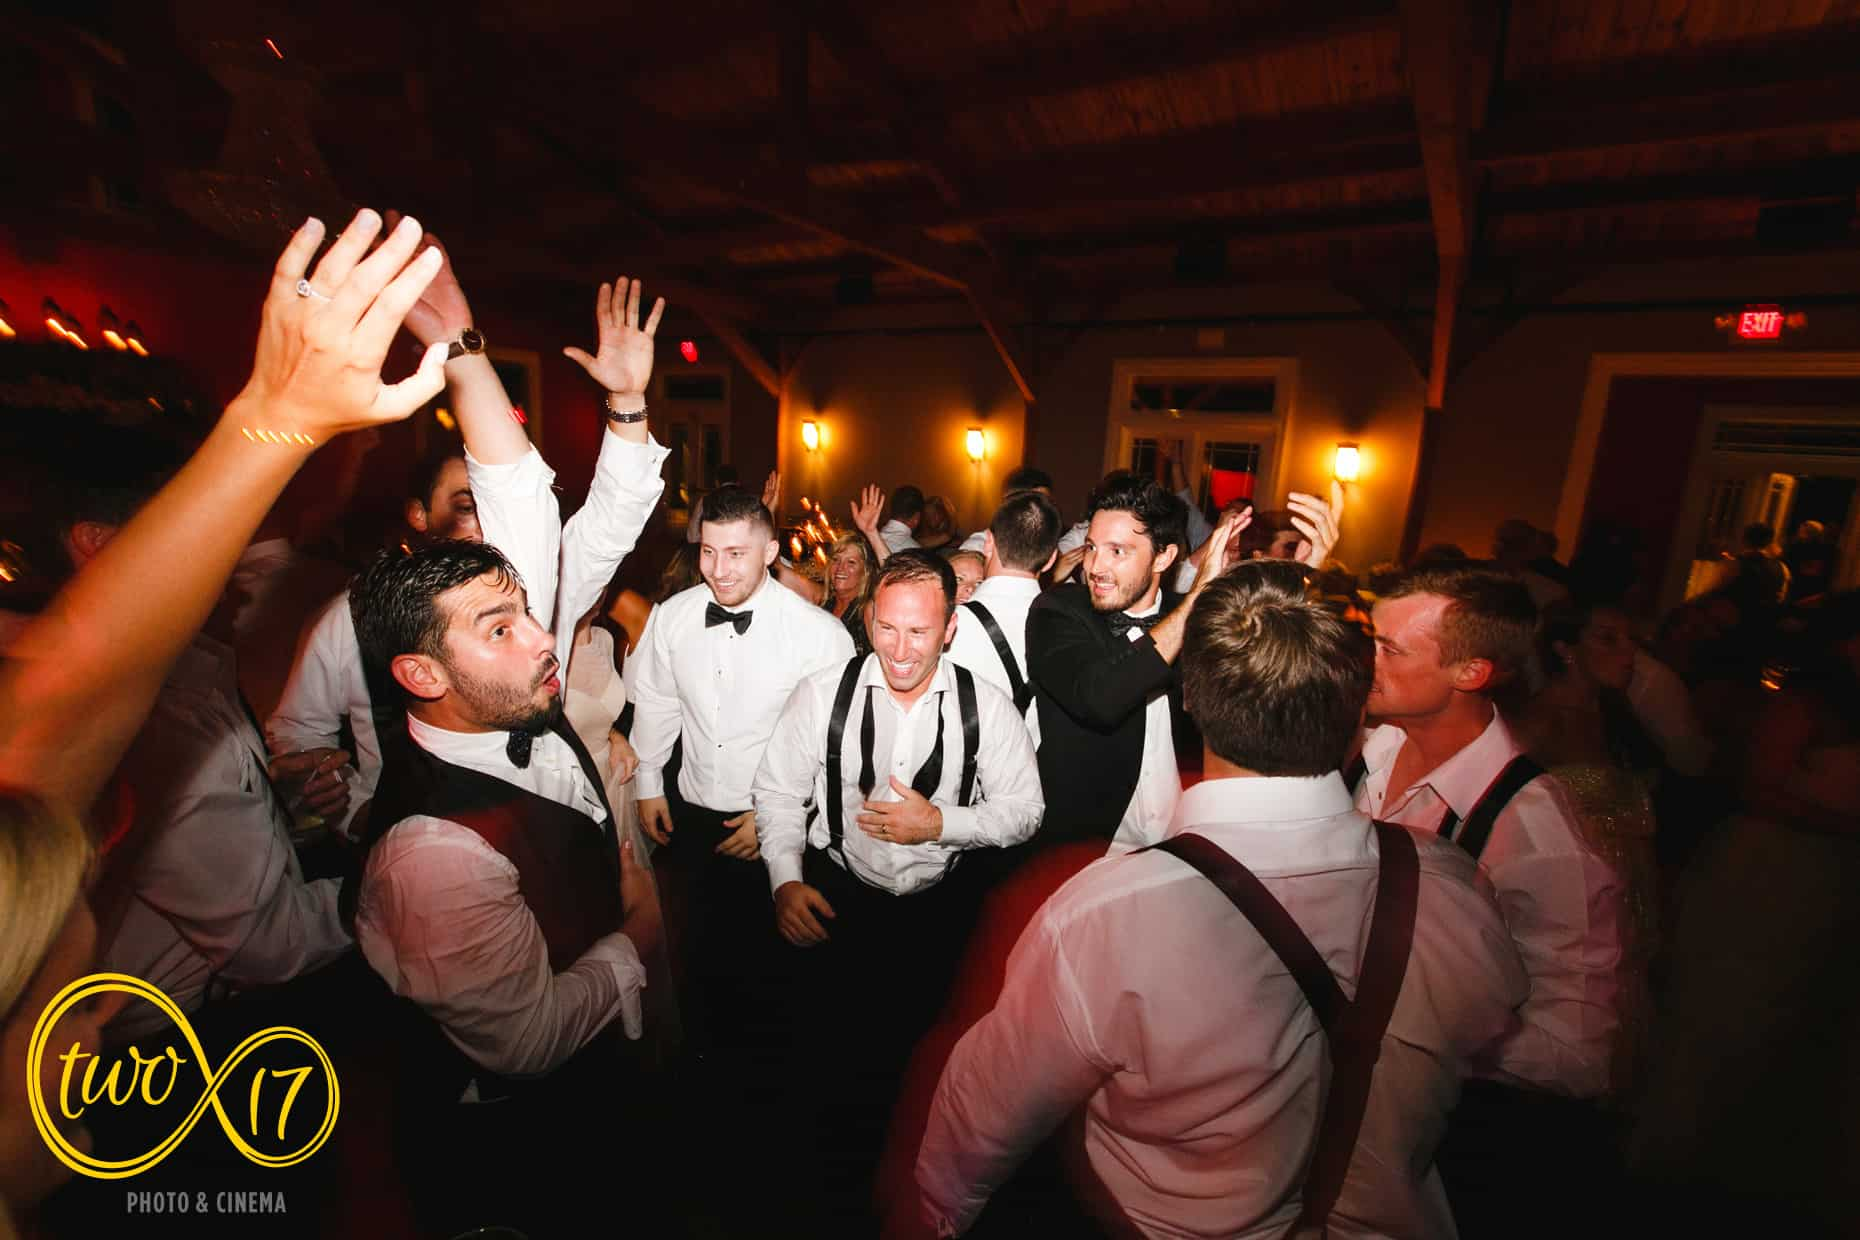 Candid wedding photographers Cape May